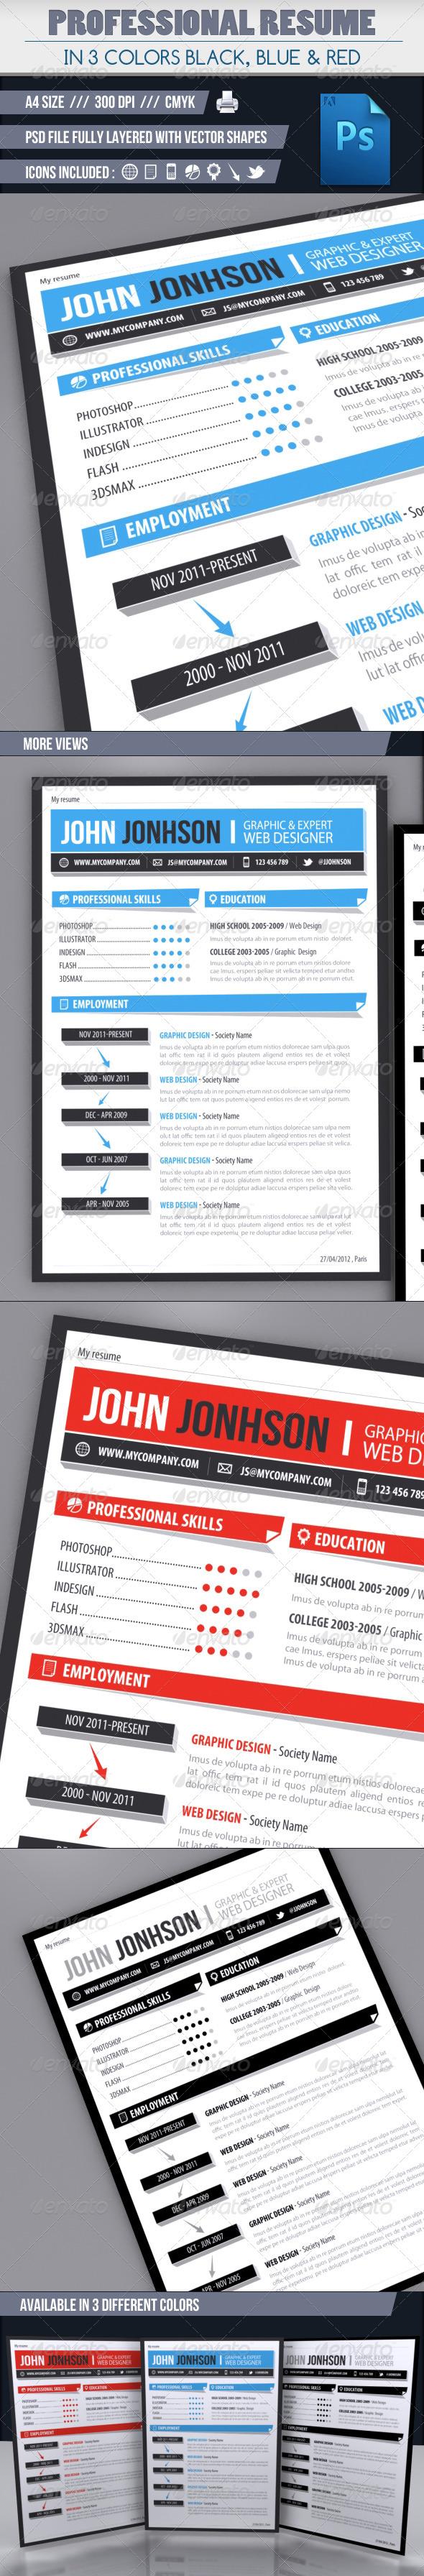 Modern resume in 3 colors